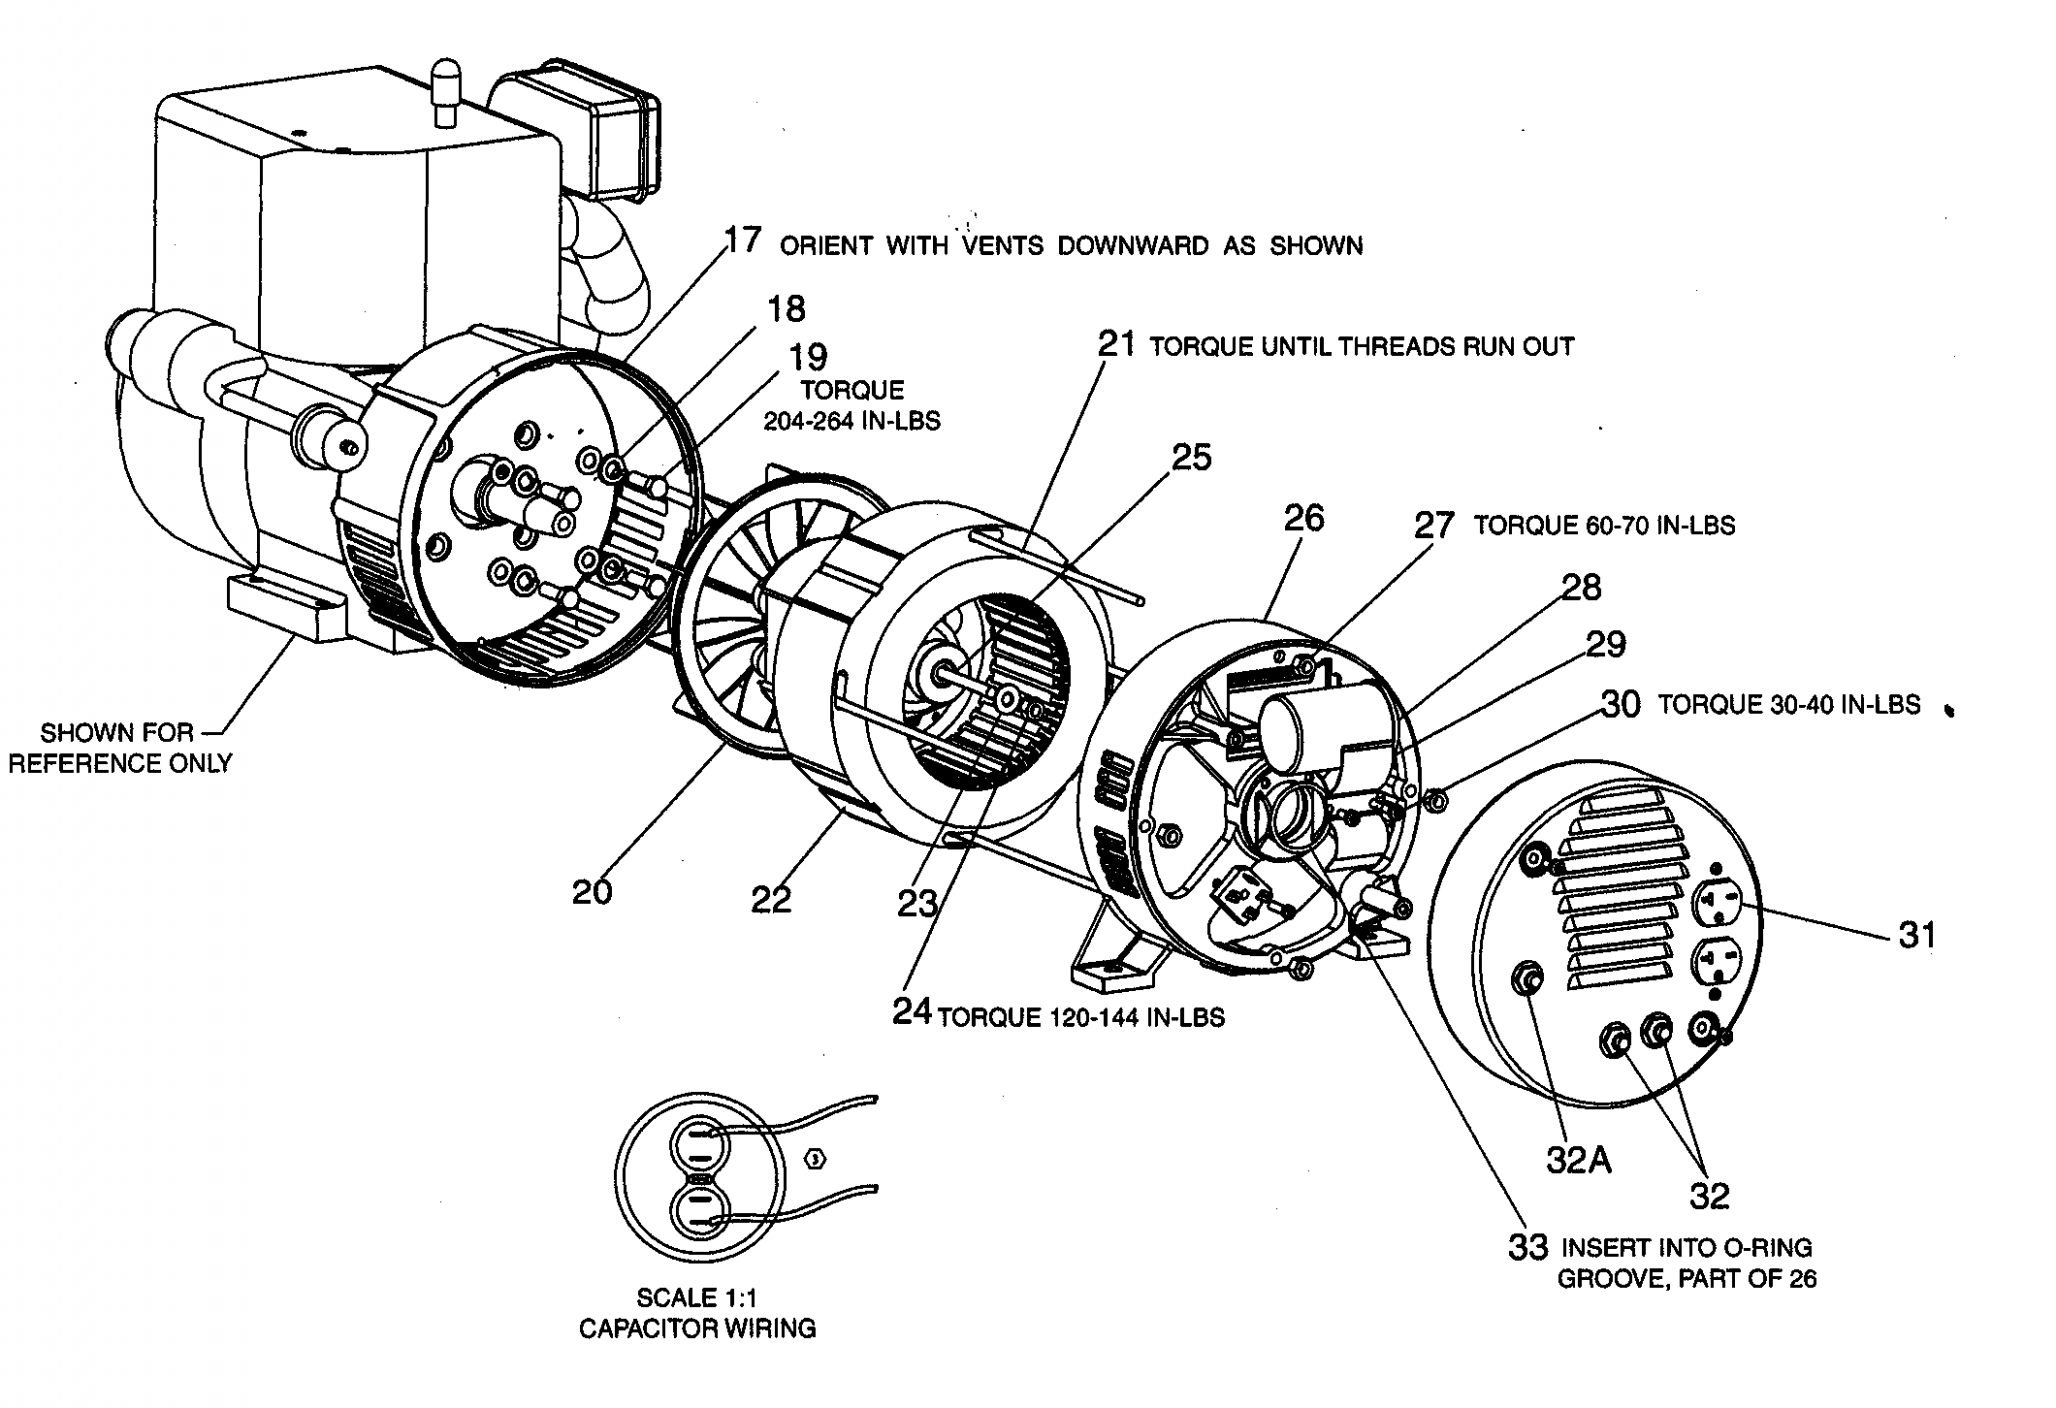 Engine Diagram Simple Generator di 2020Pinterest